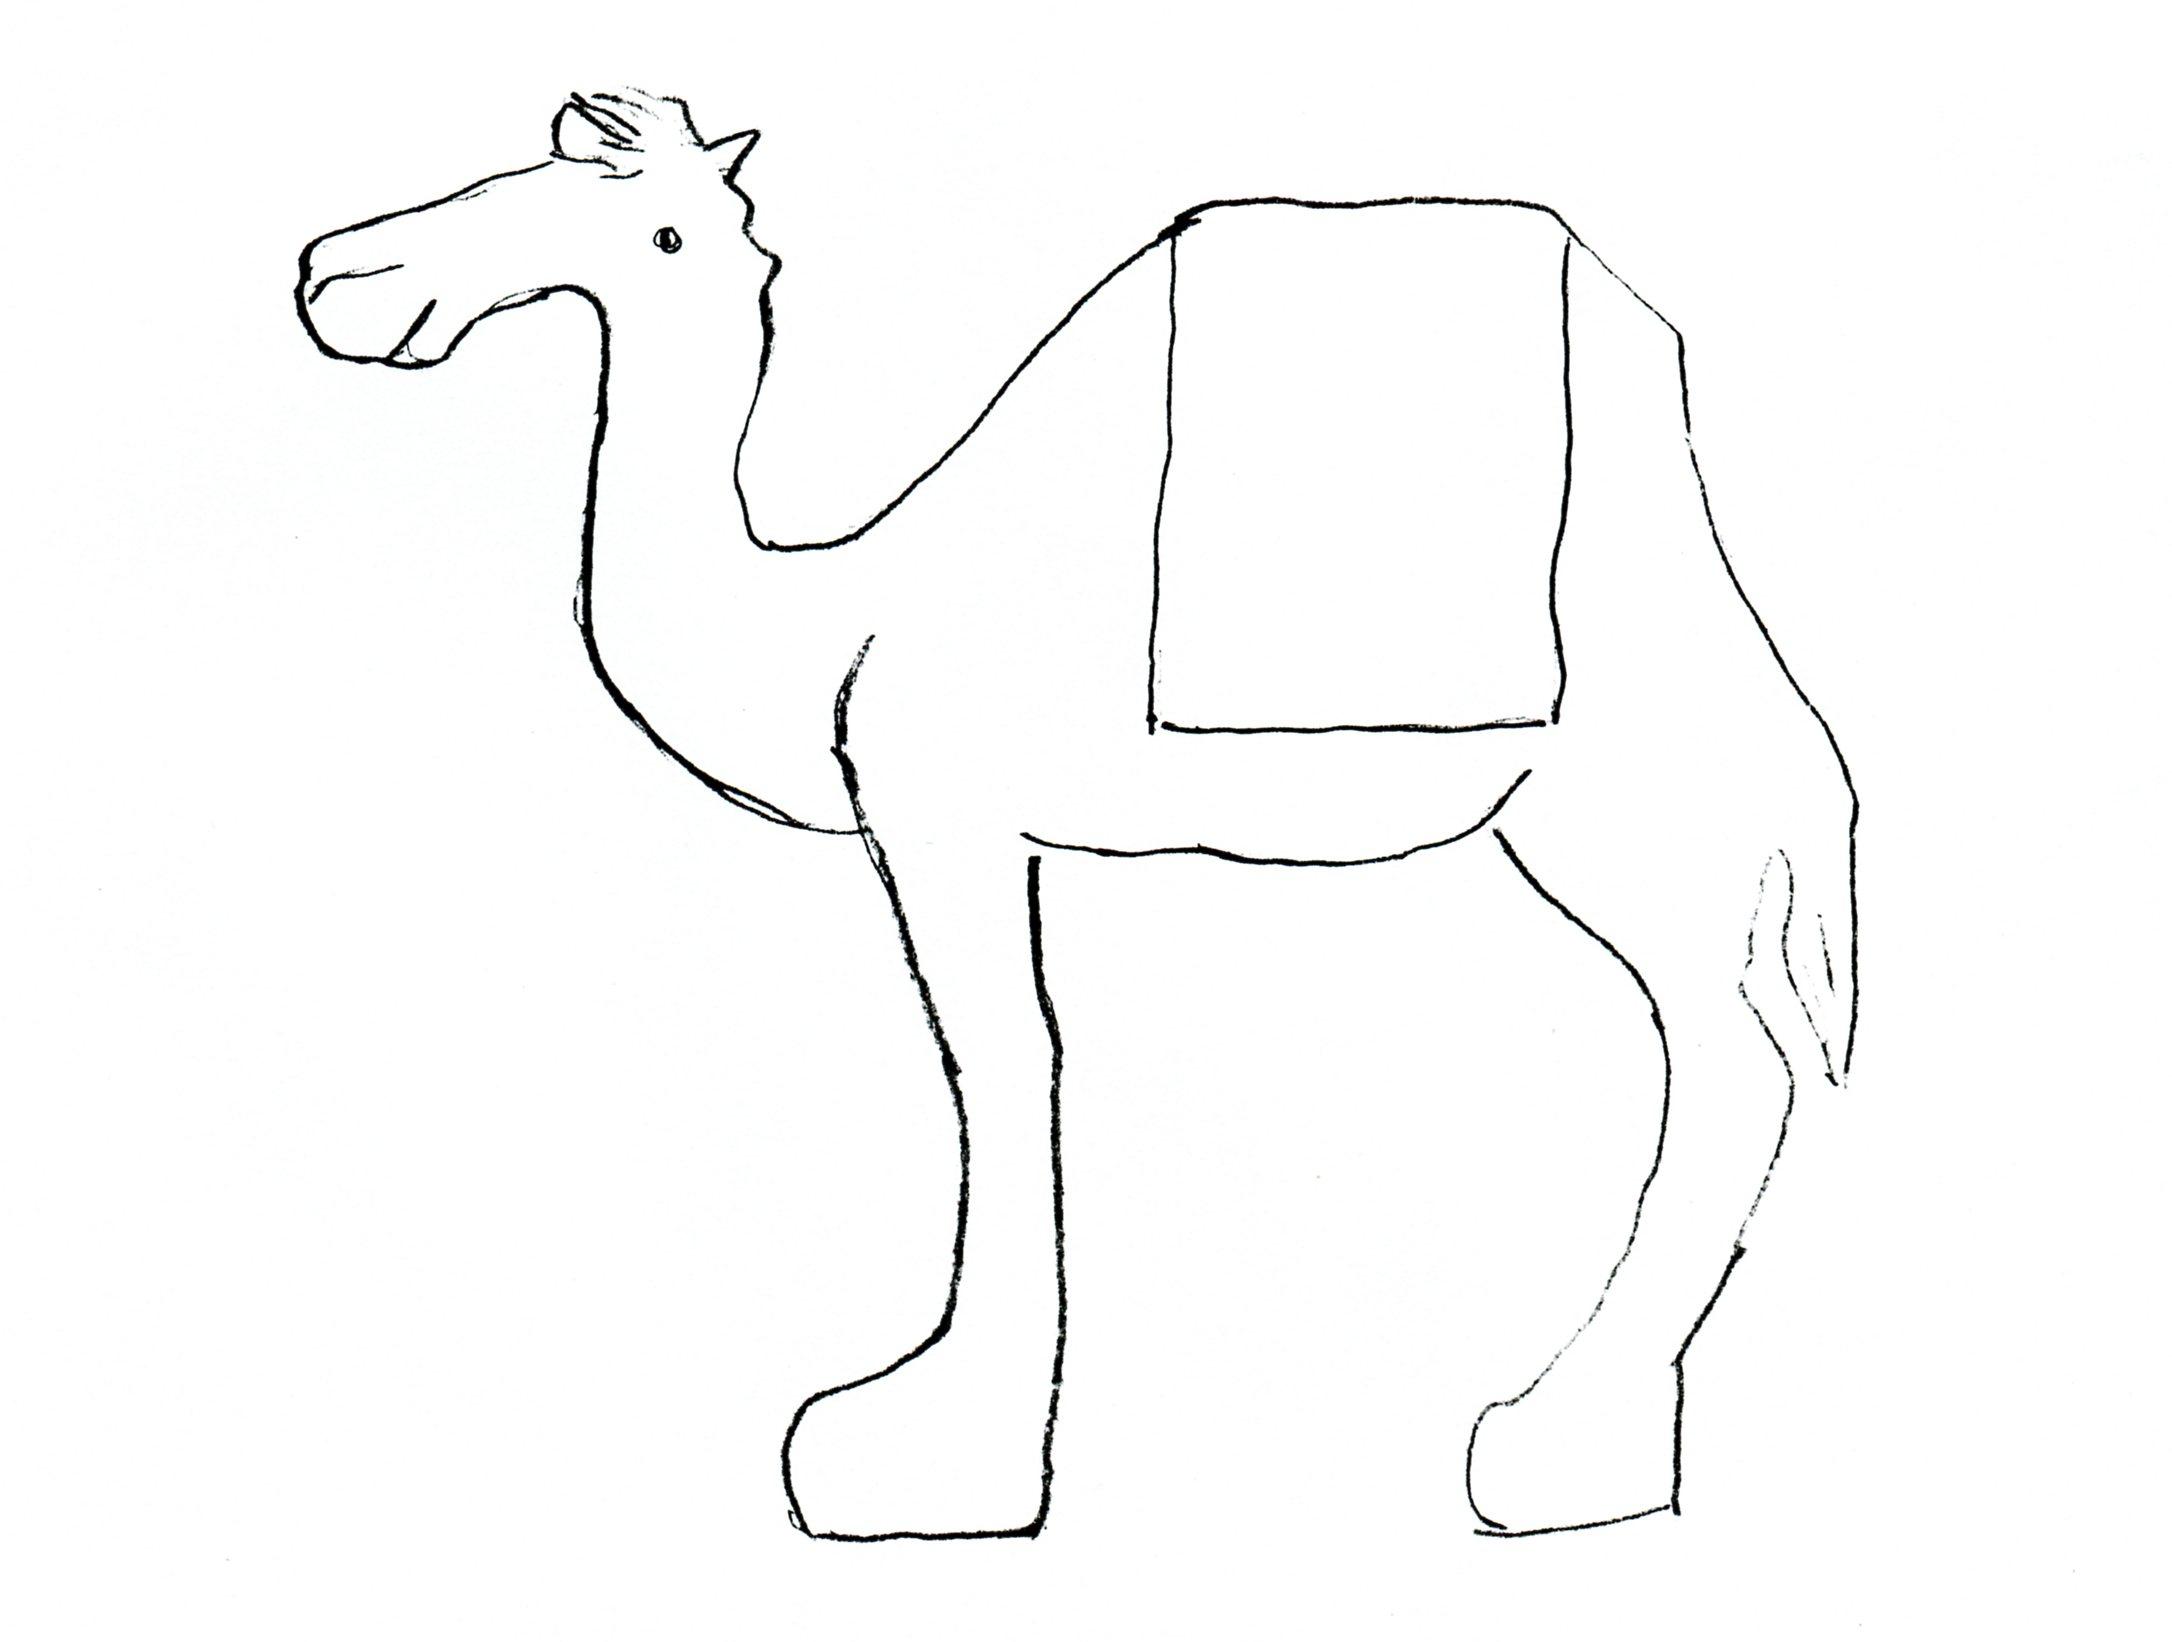 Cool Drawing Templates For Kids Printable Pencil Template #25334 - Free Printable Pencil Drawings